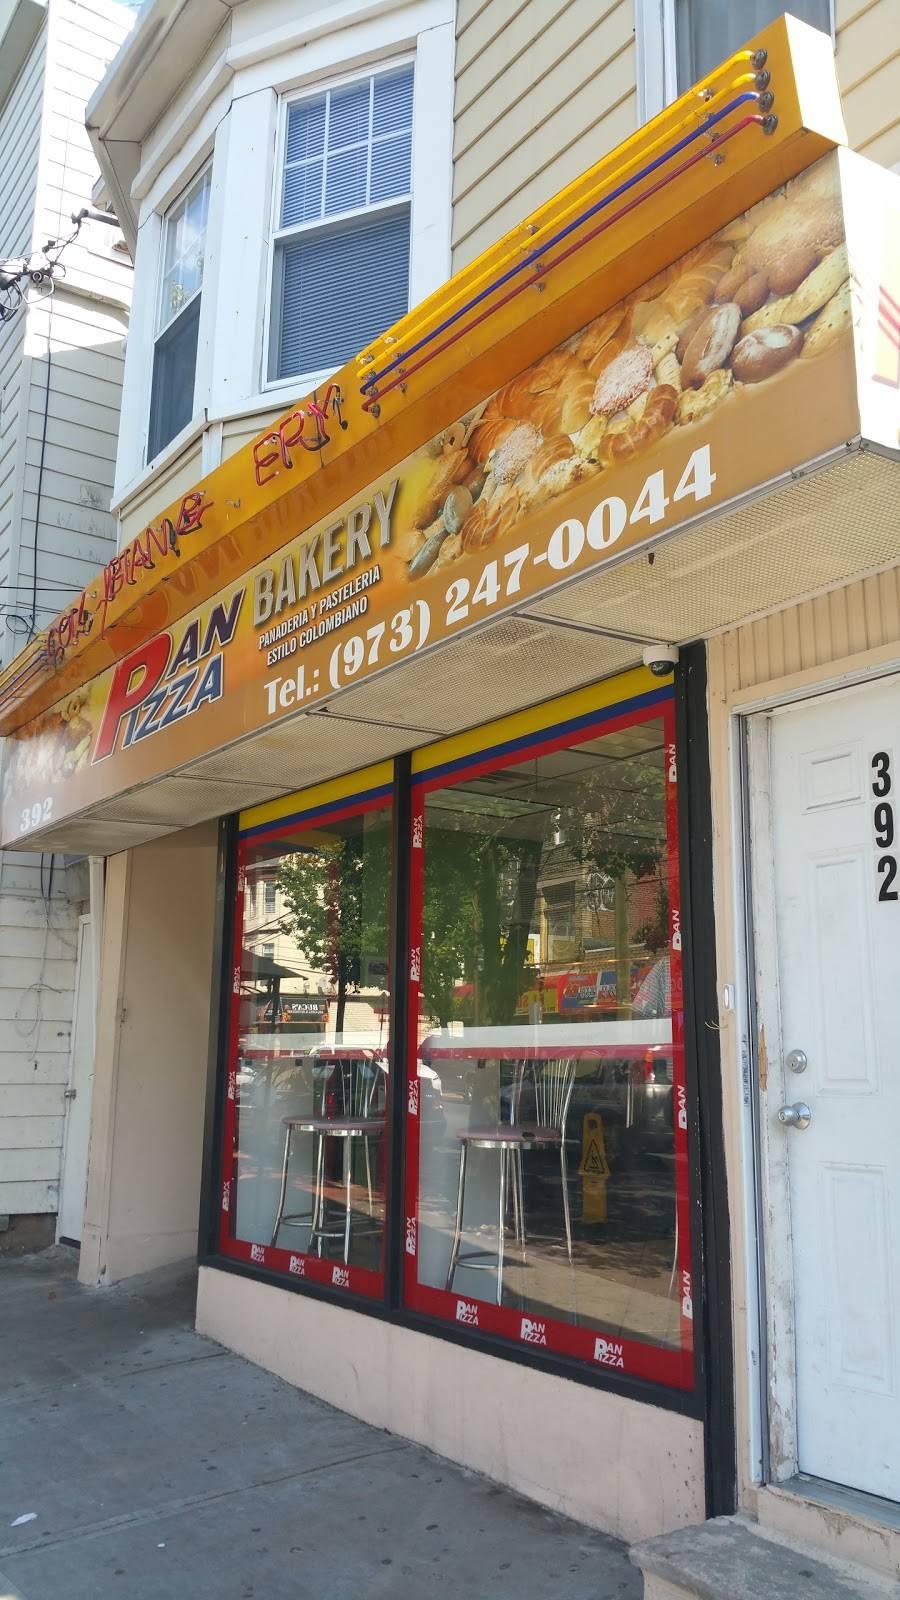 Pan Pizza Bakery   restaurant   392 21st Ave, Paterson, NJ 07513, USA